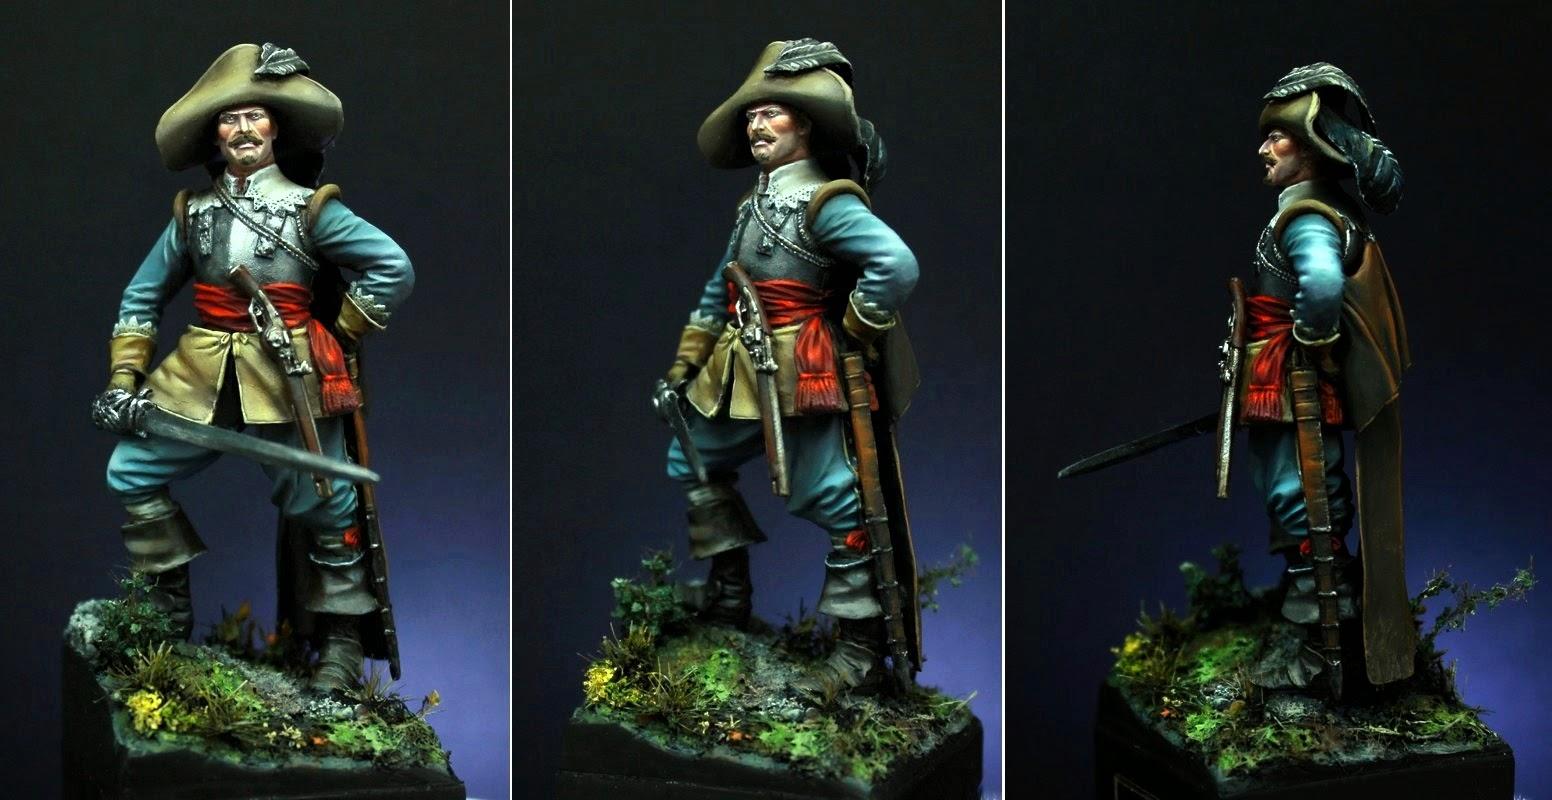 The Mercenary por Rafa Coll